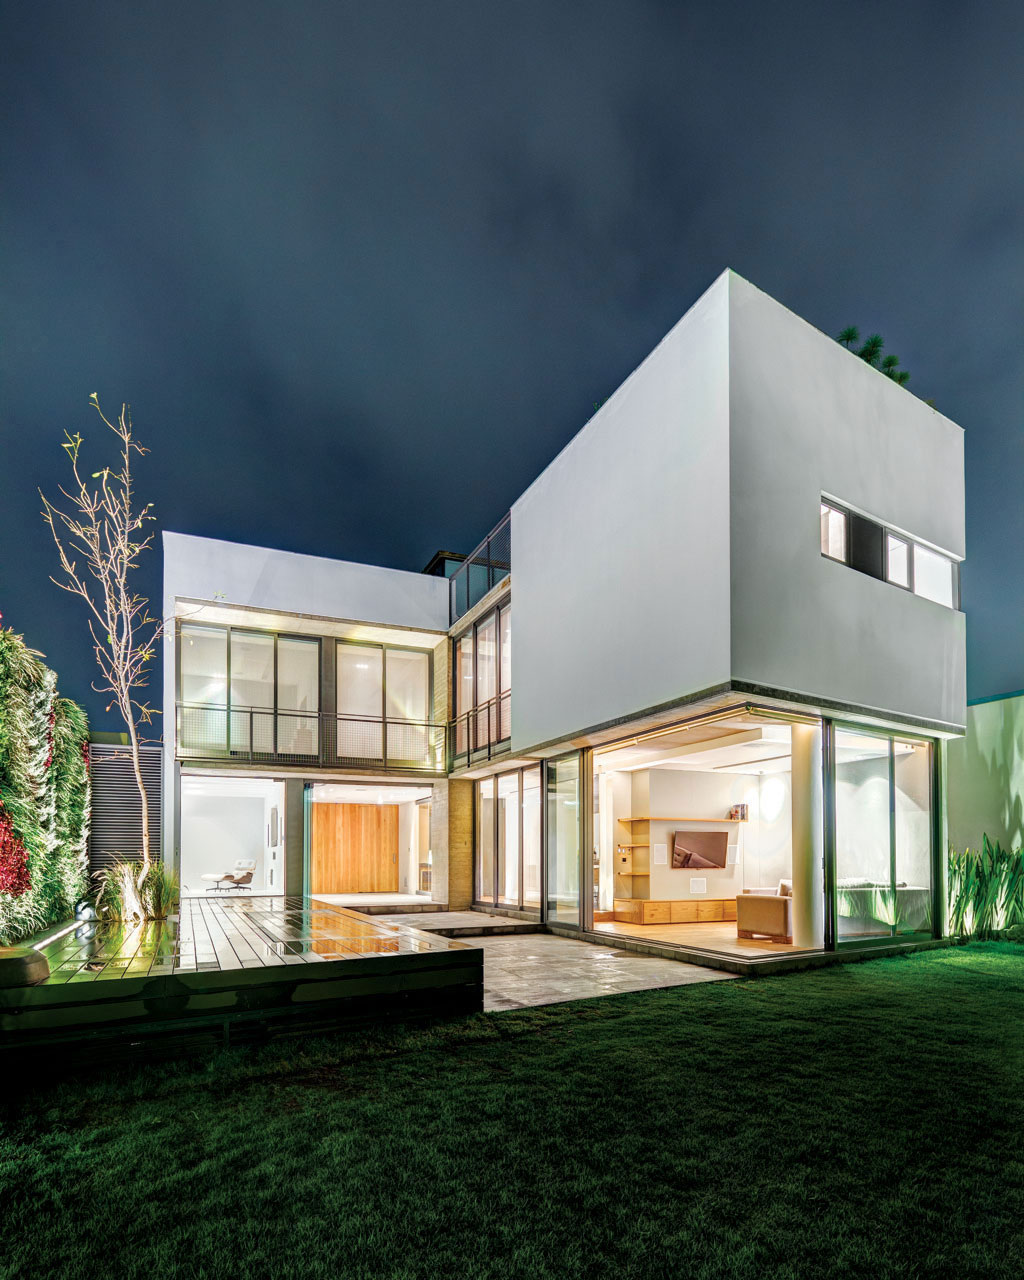 Casa Valna by JSa Arquitectura